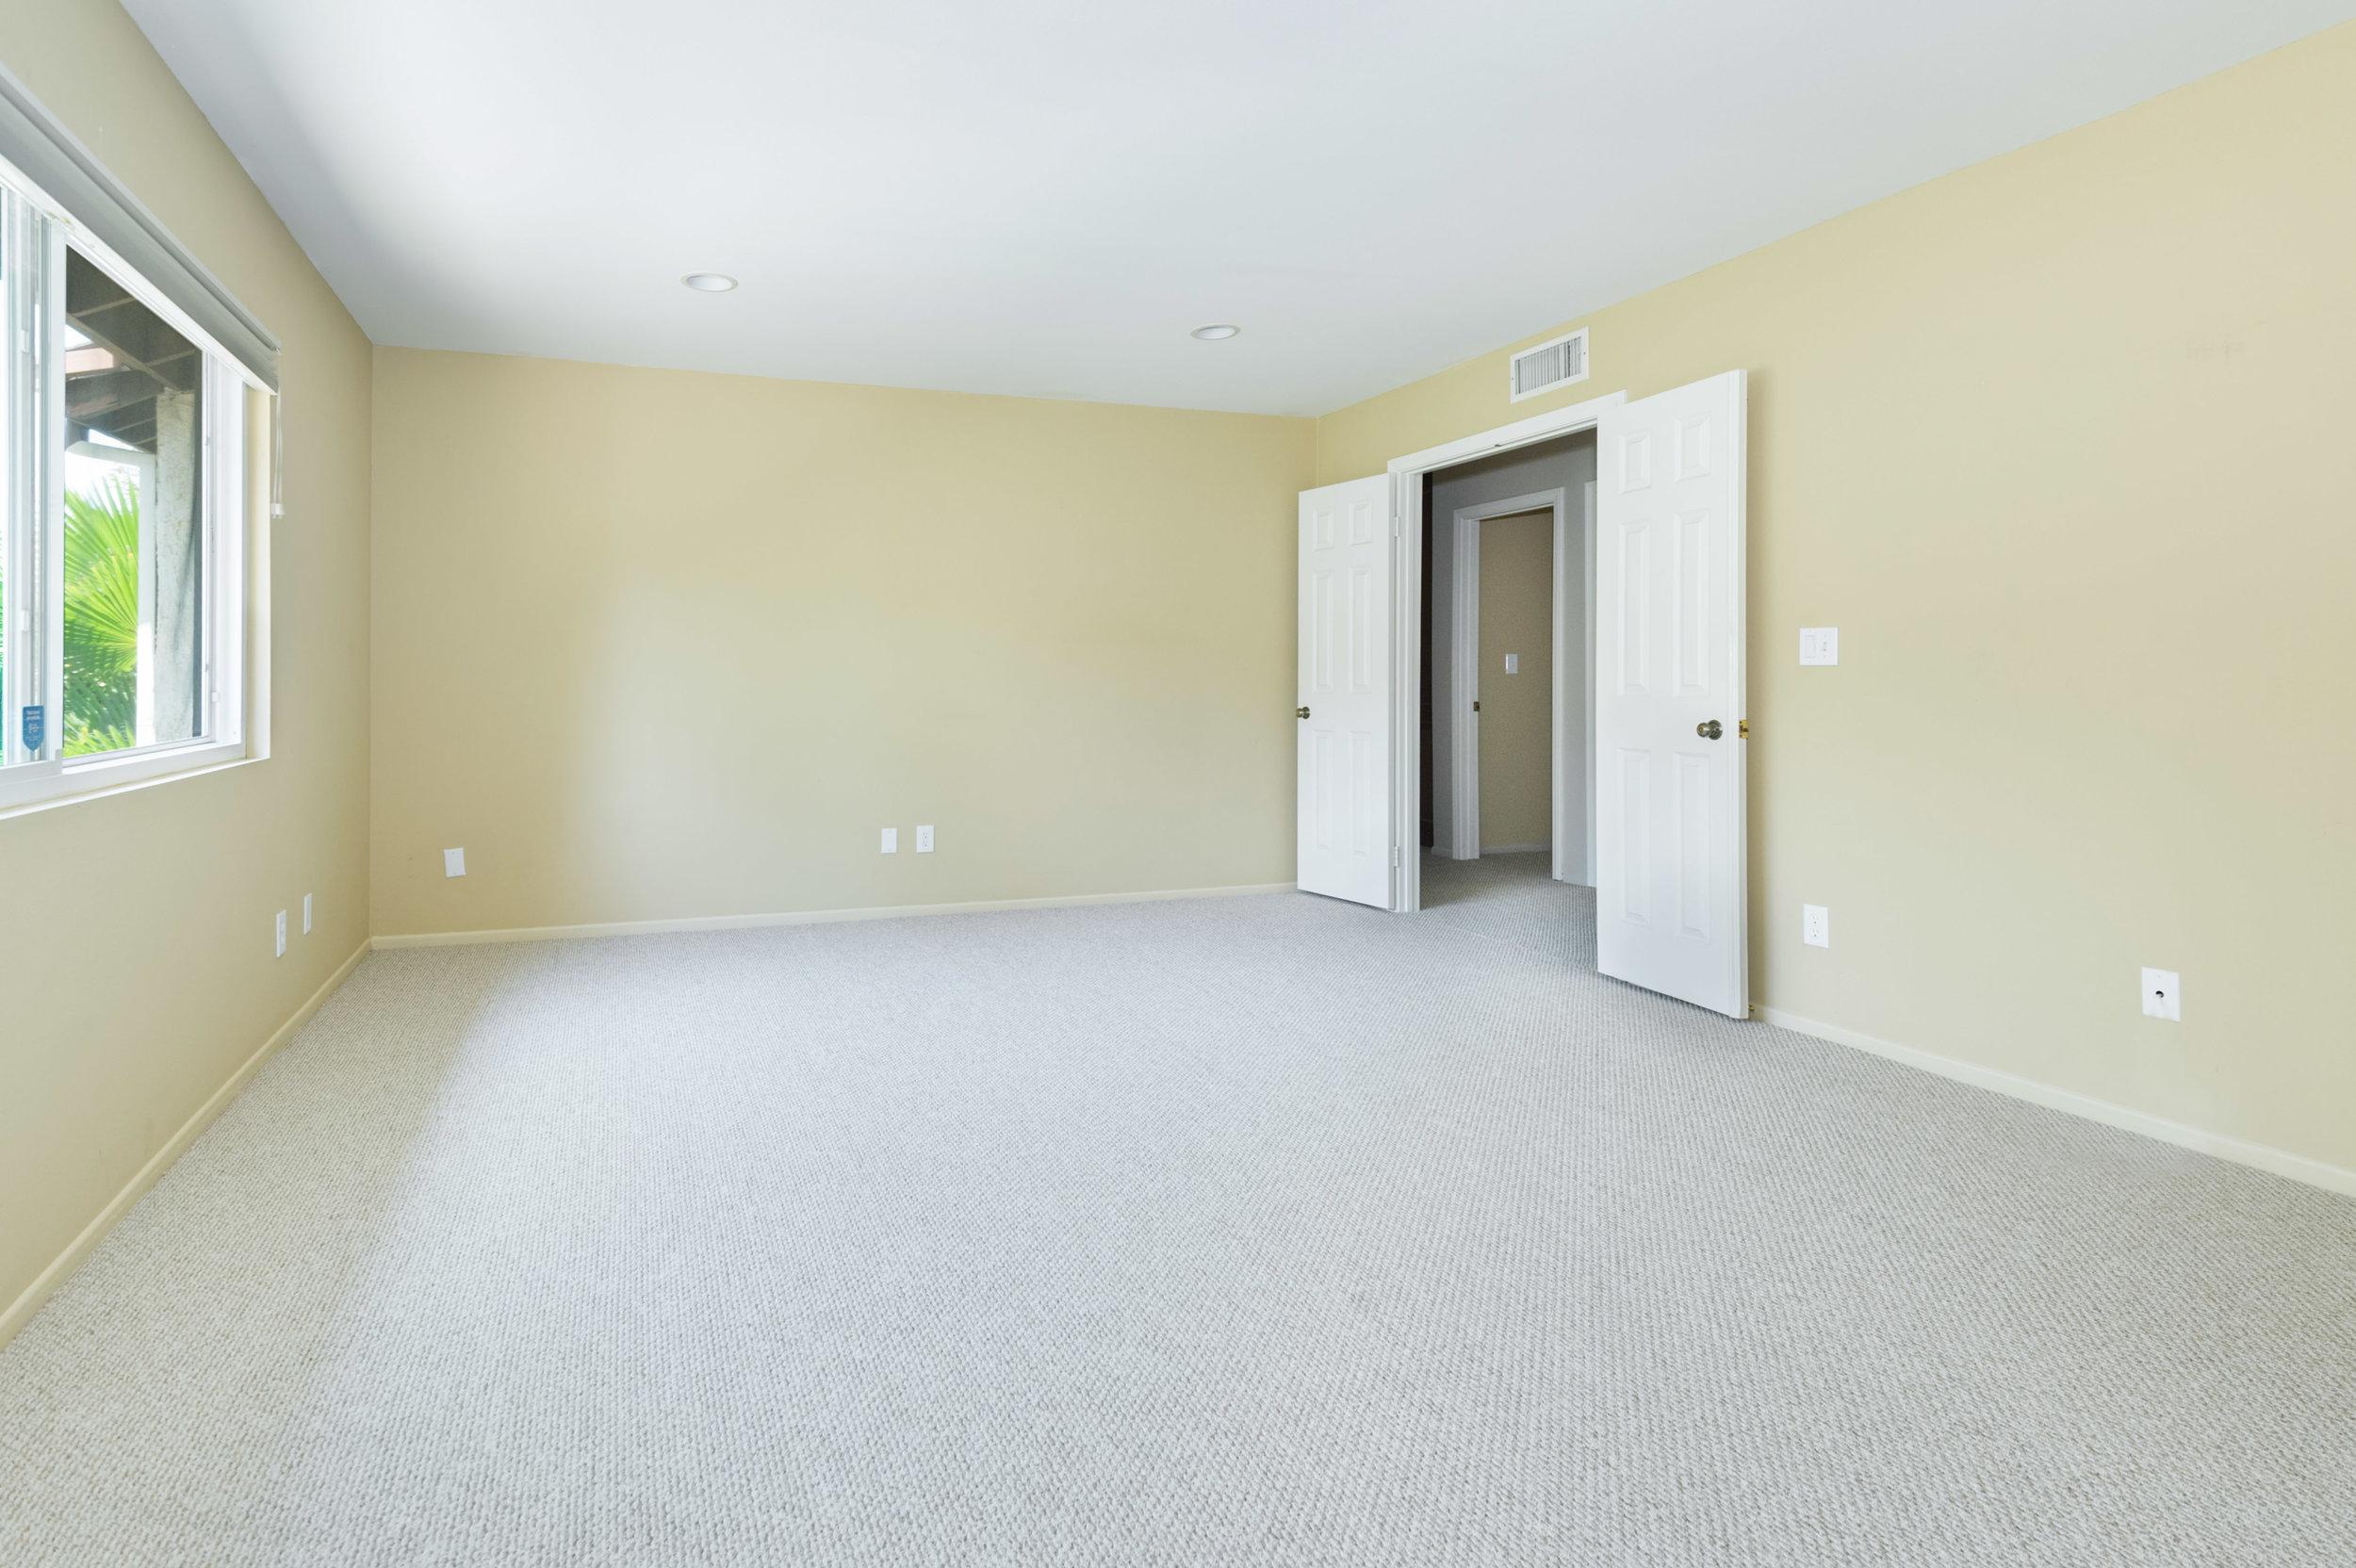 012 bedroom 8832 Moorcroft Avenue West Hills For Sale Lease The Malibu Life Team Luxury Real Estate.jpg